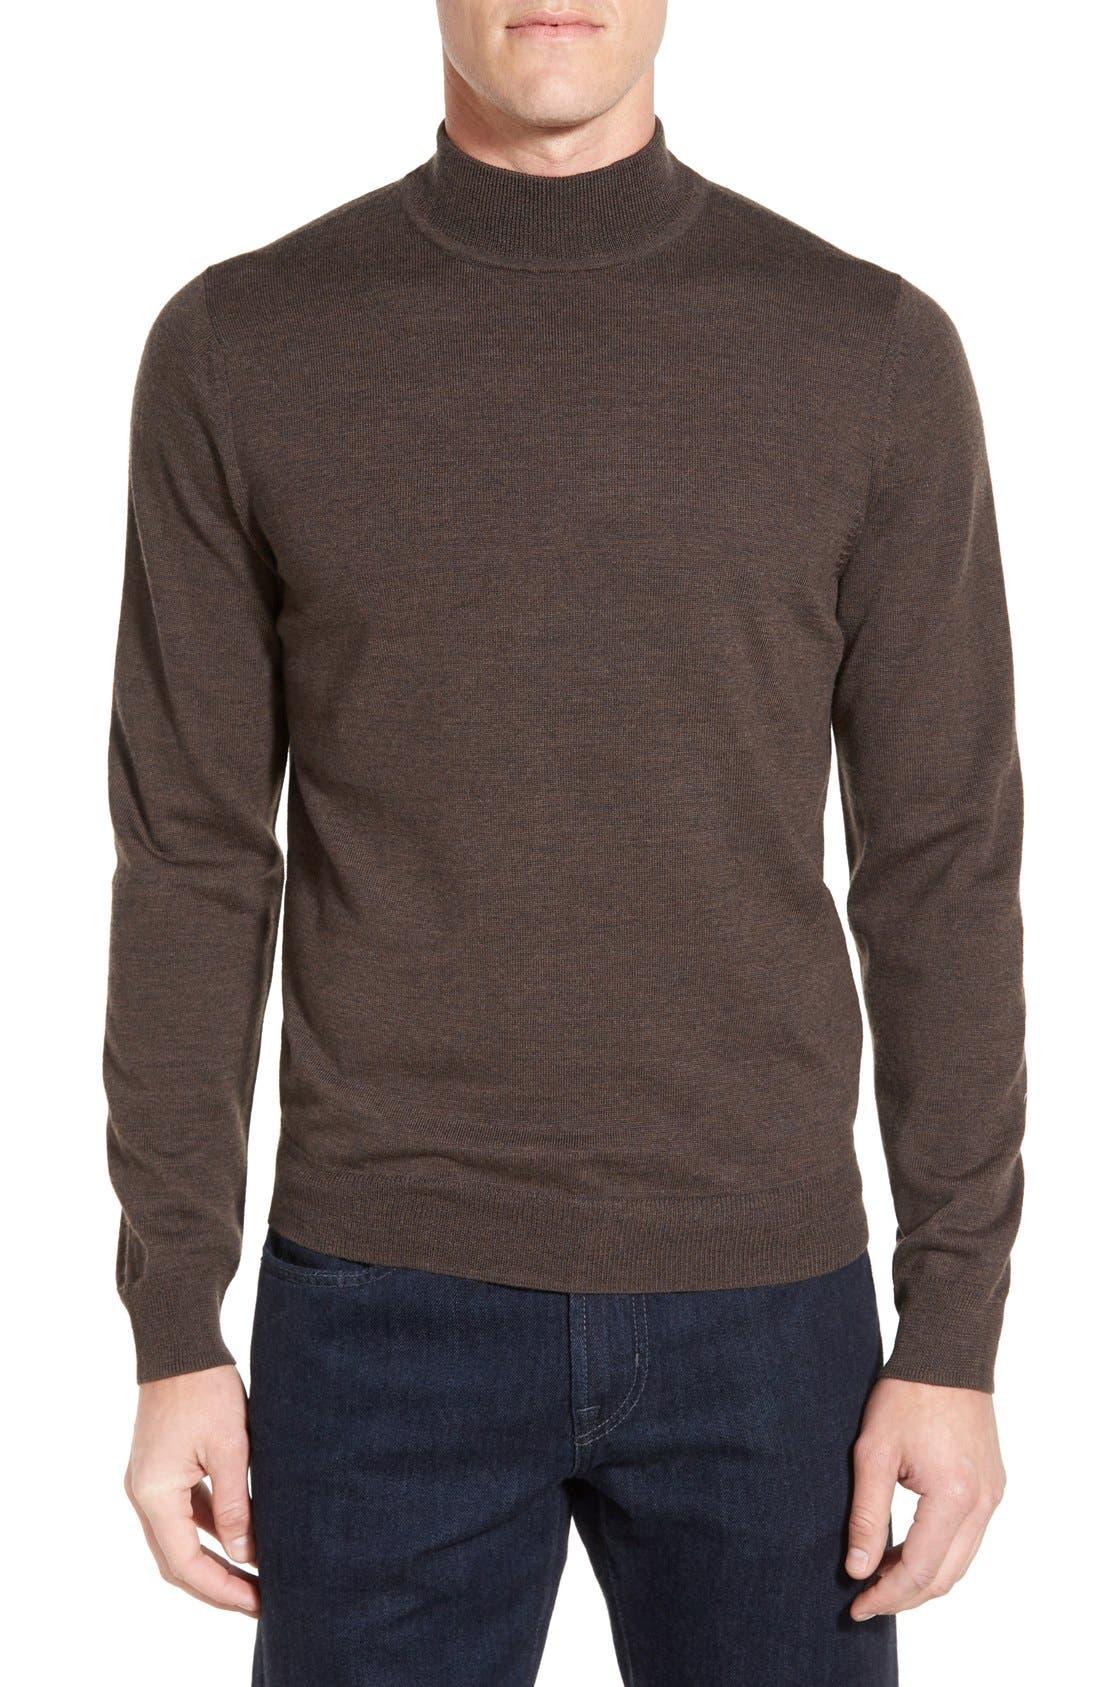 Alternate Image 1 Selected - Nordstrom Mock Neck Merino Wool Sweater (Regular & Tall)